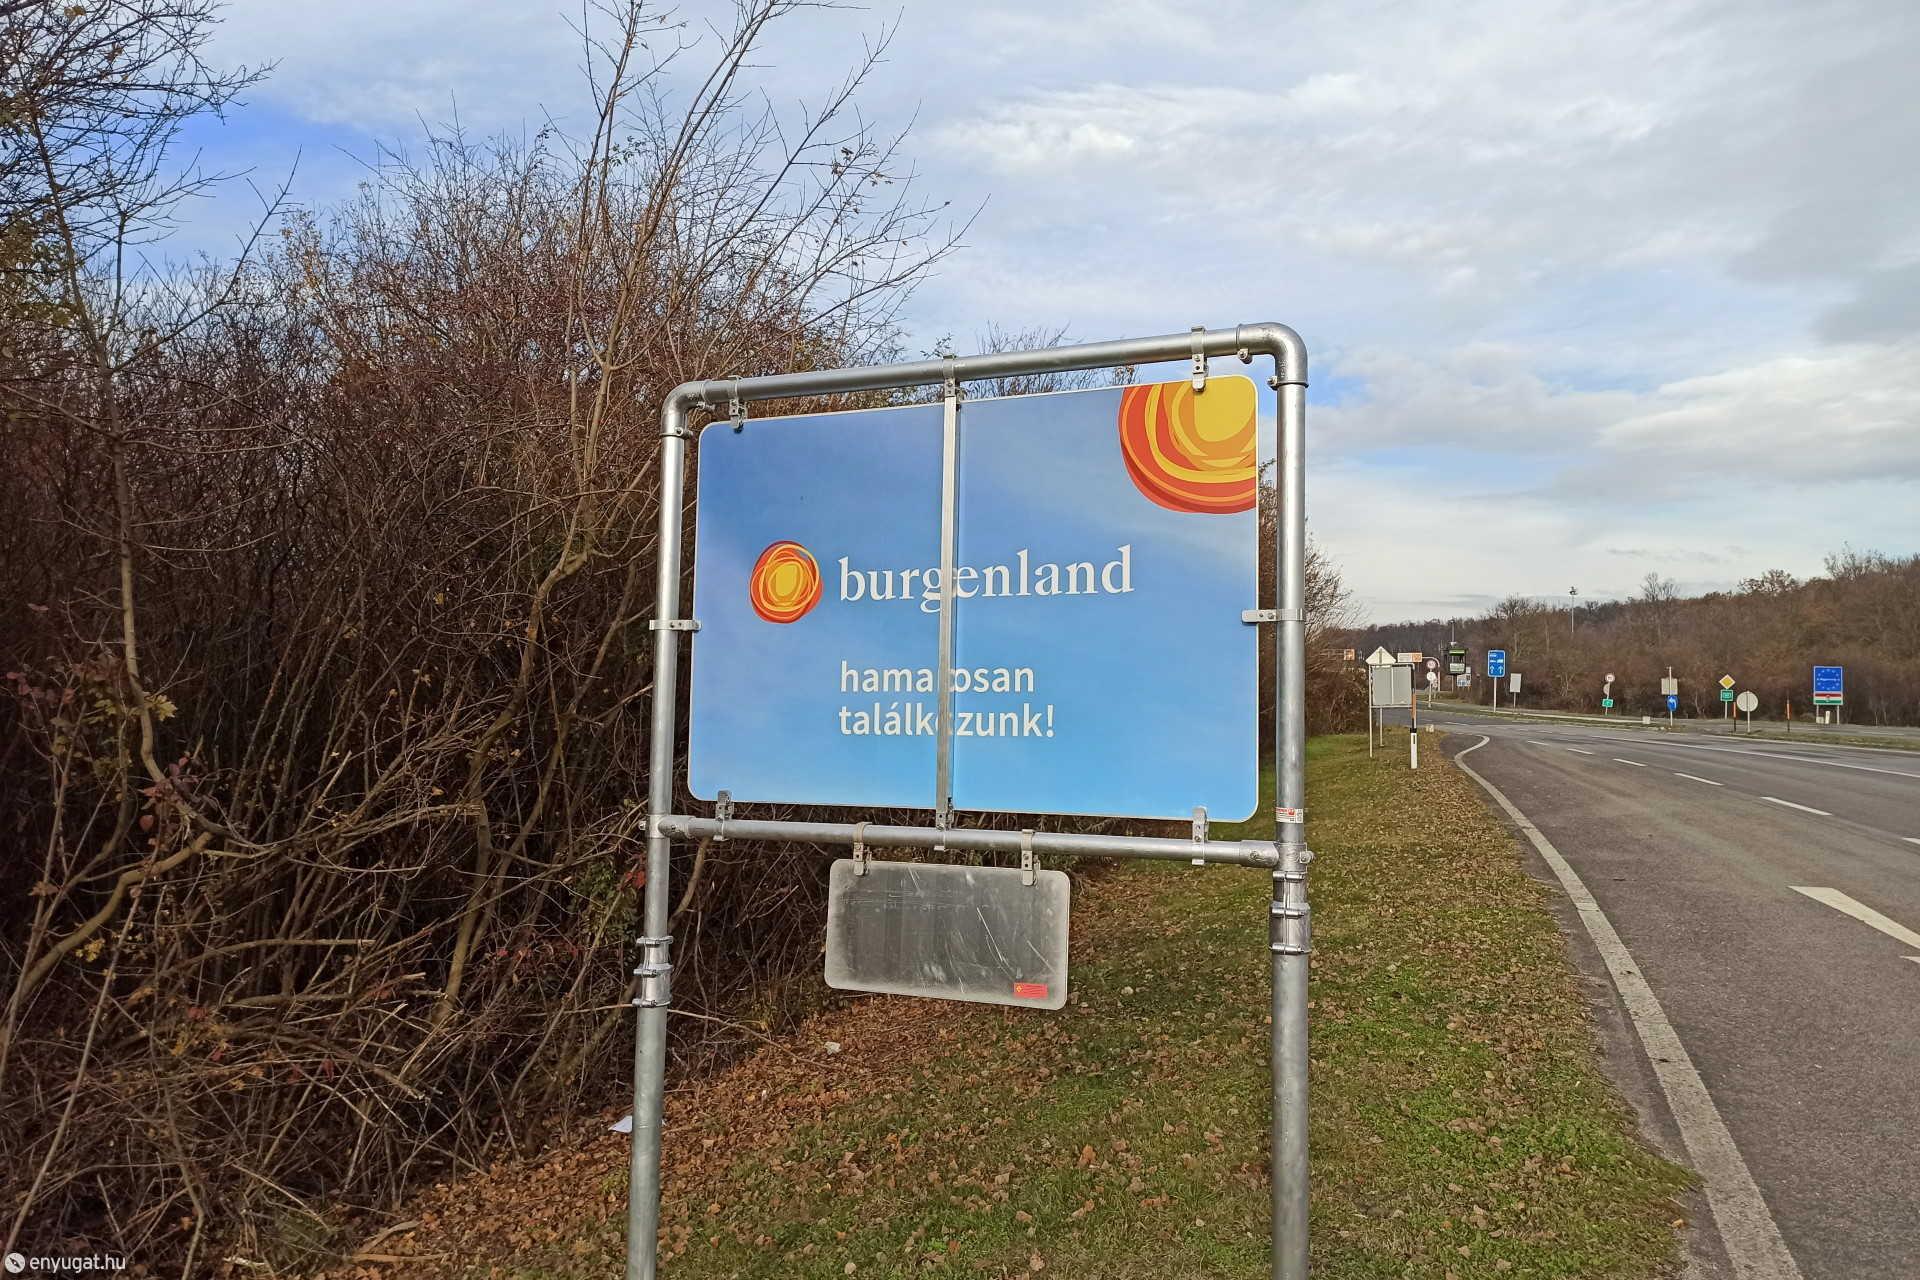 Burgenland: hamarosan találkozunk!